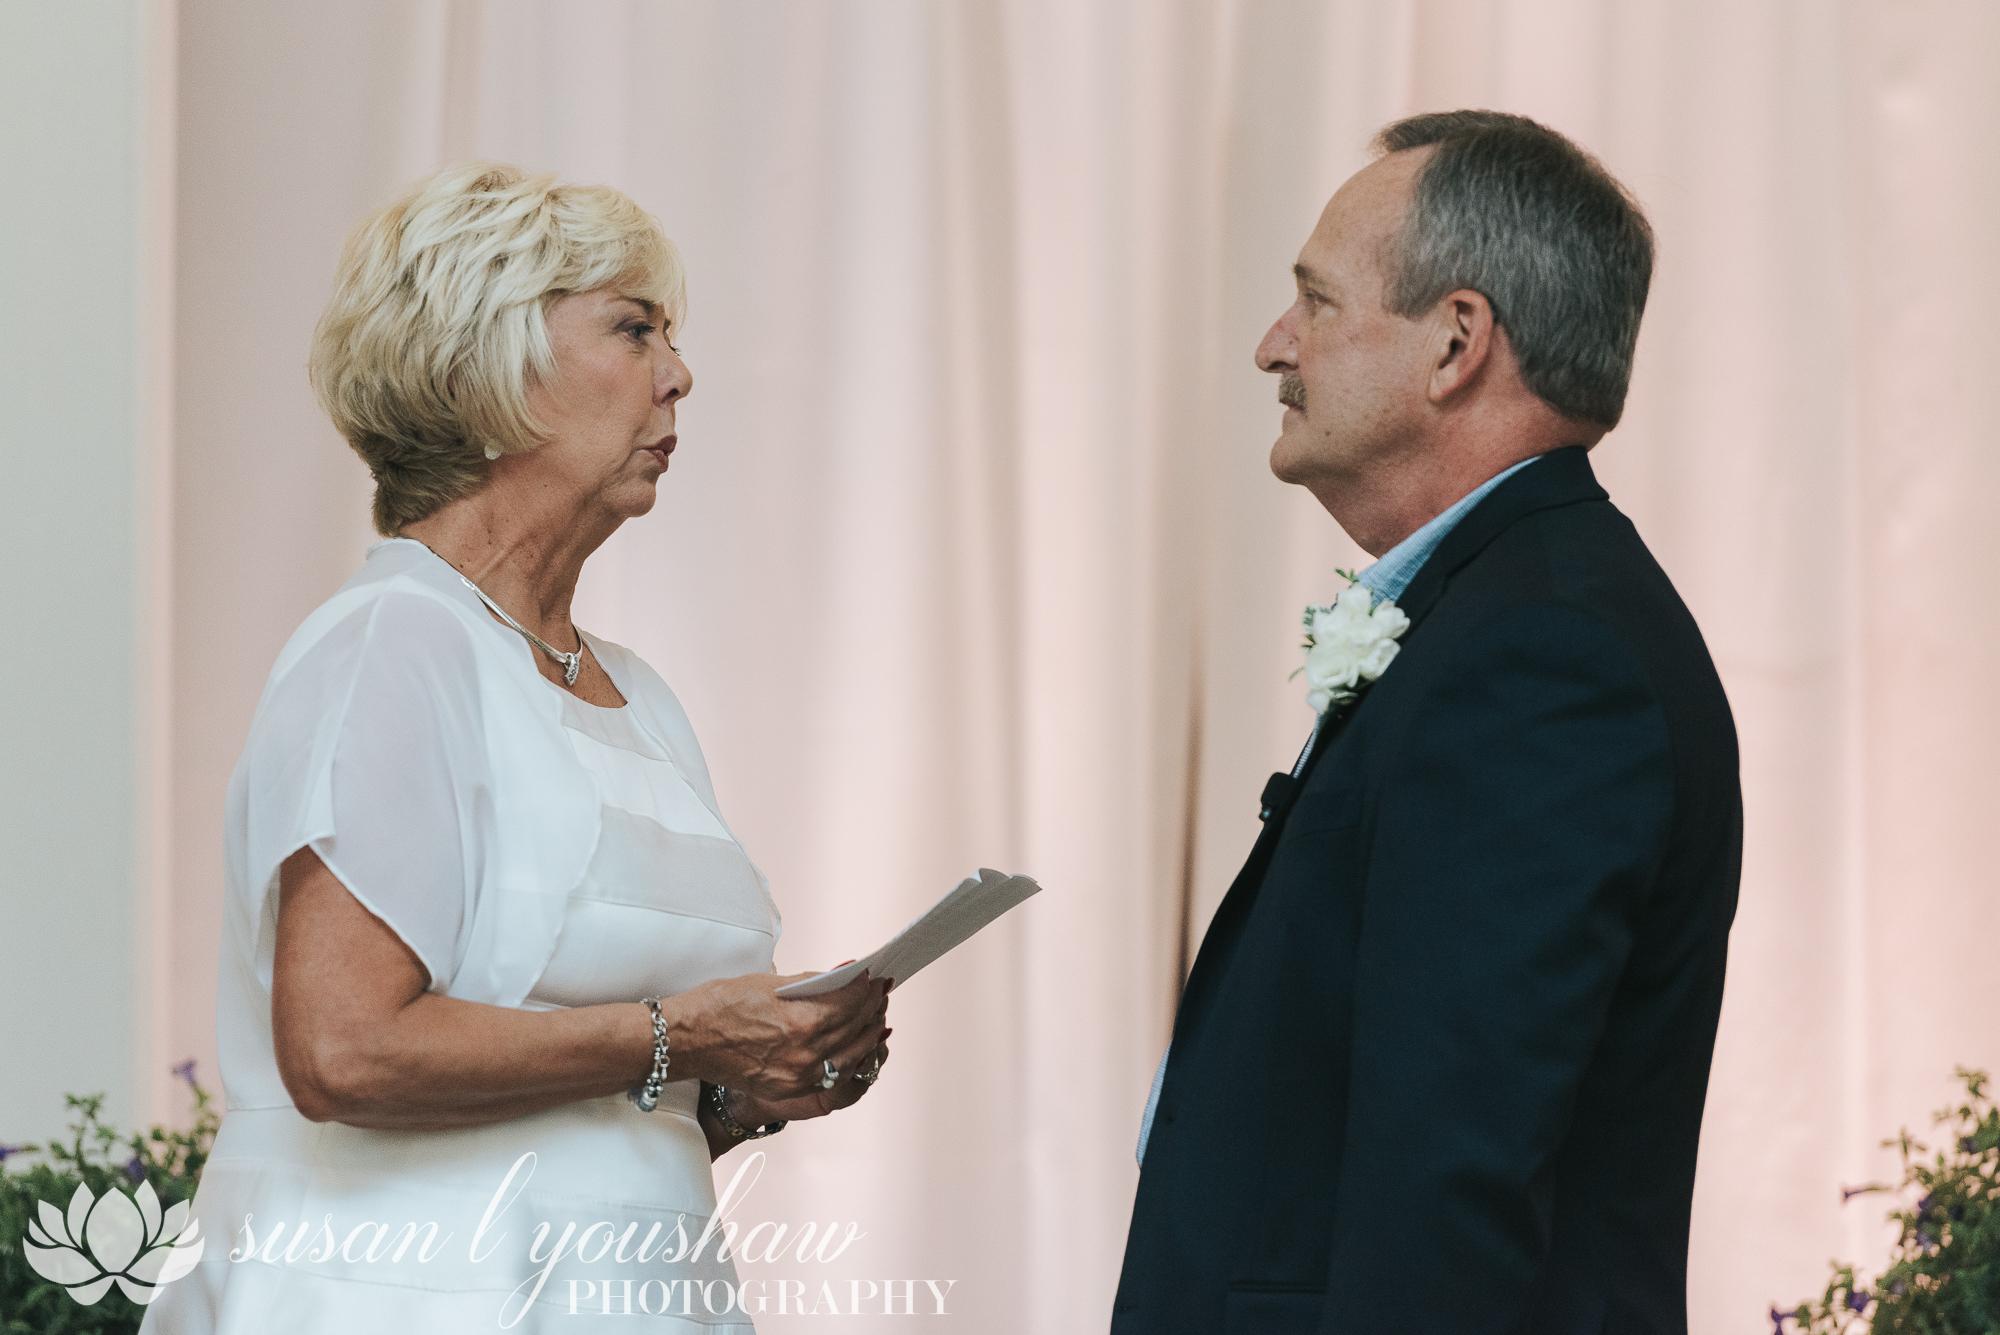 BLOG Carolyn Adams and Jim McCune 07-04-2018 SLY Photography-82.jpg